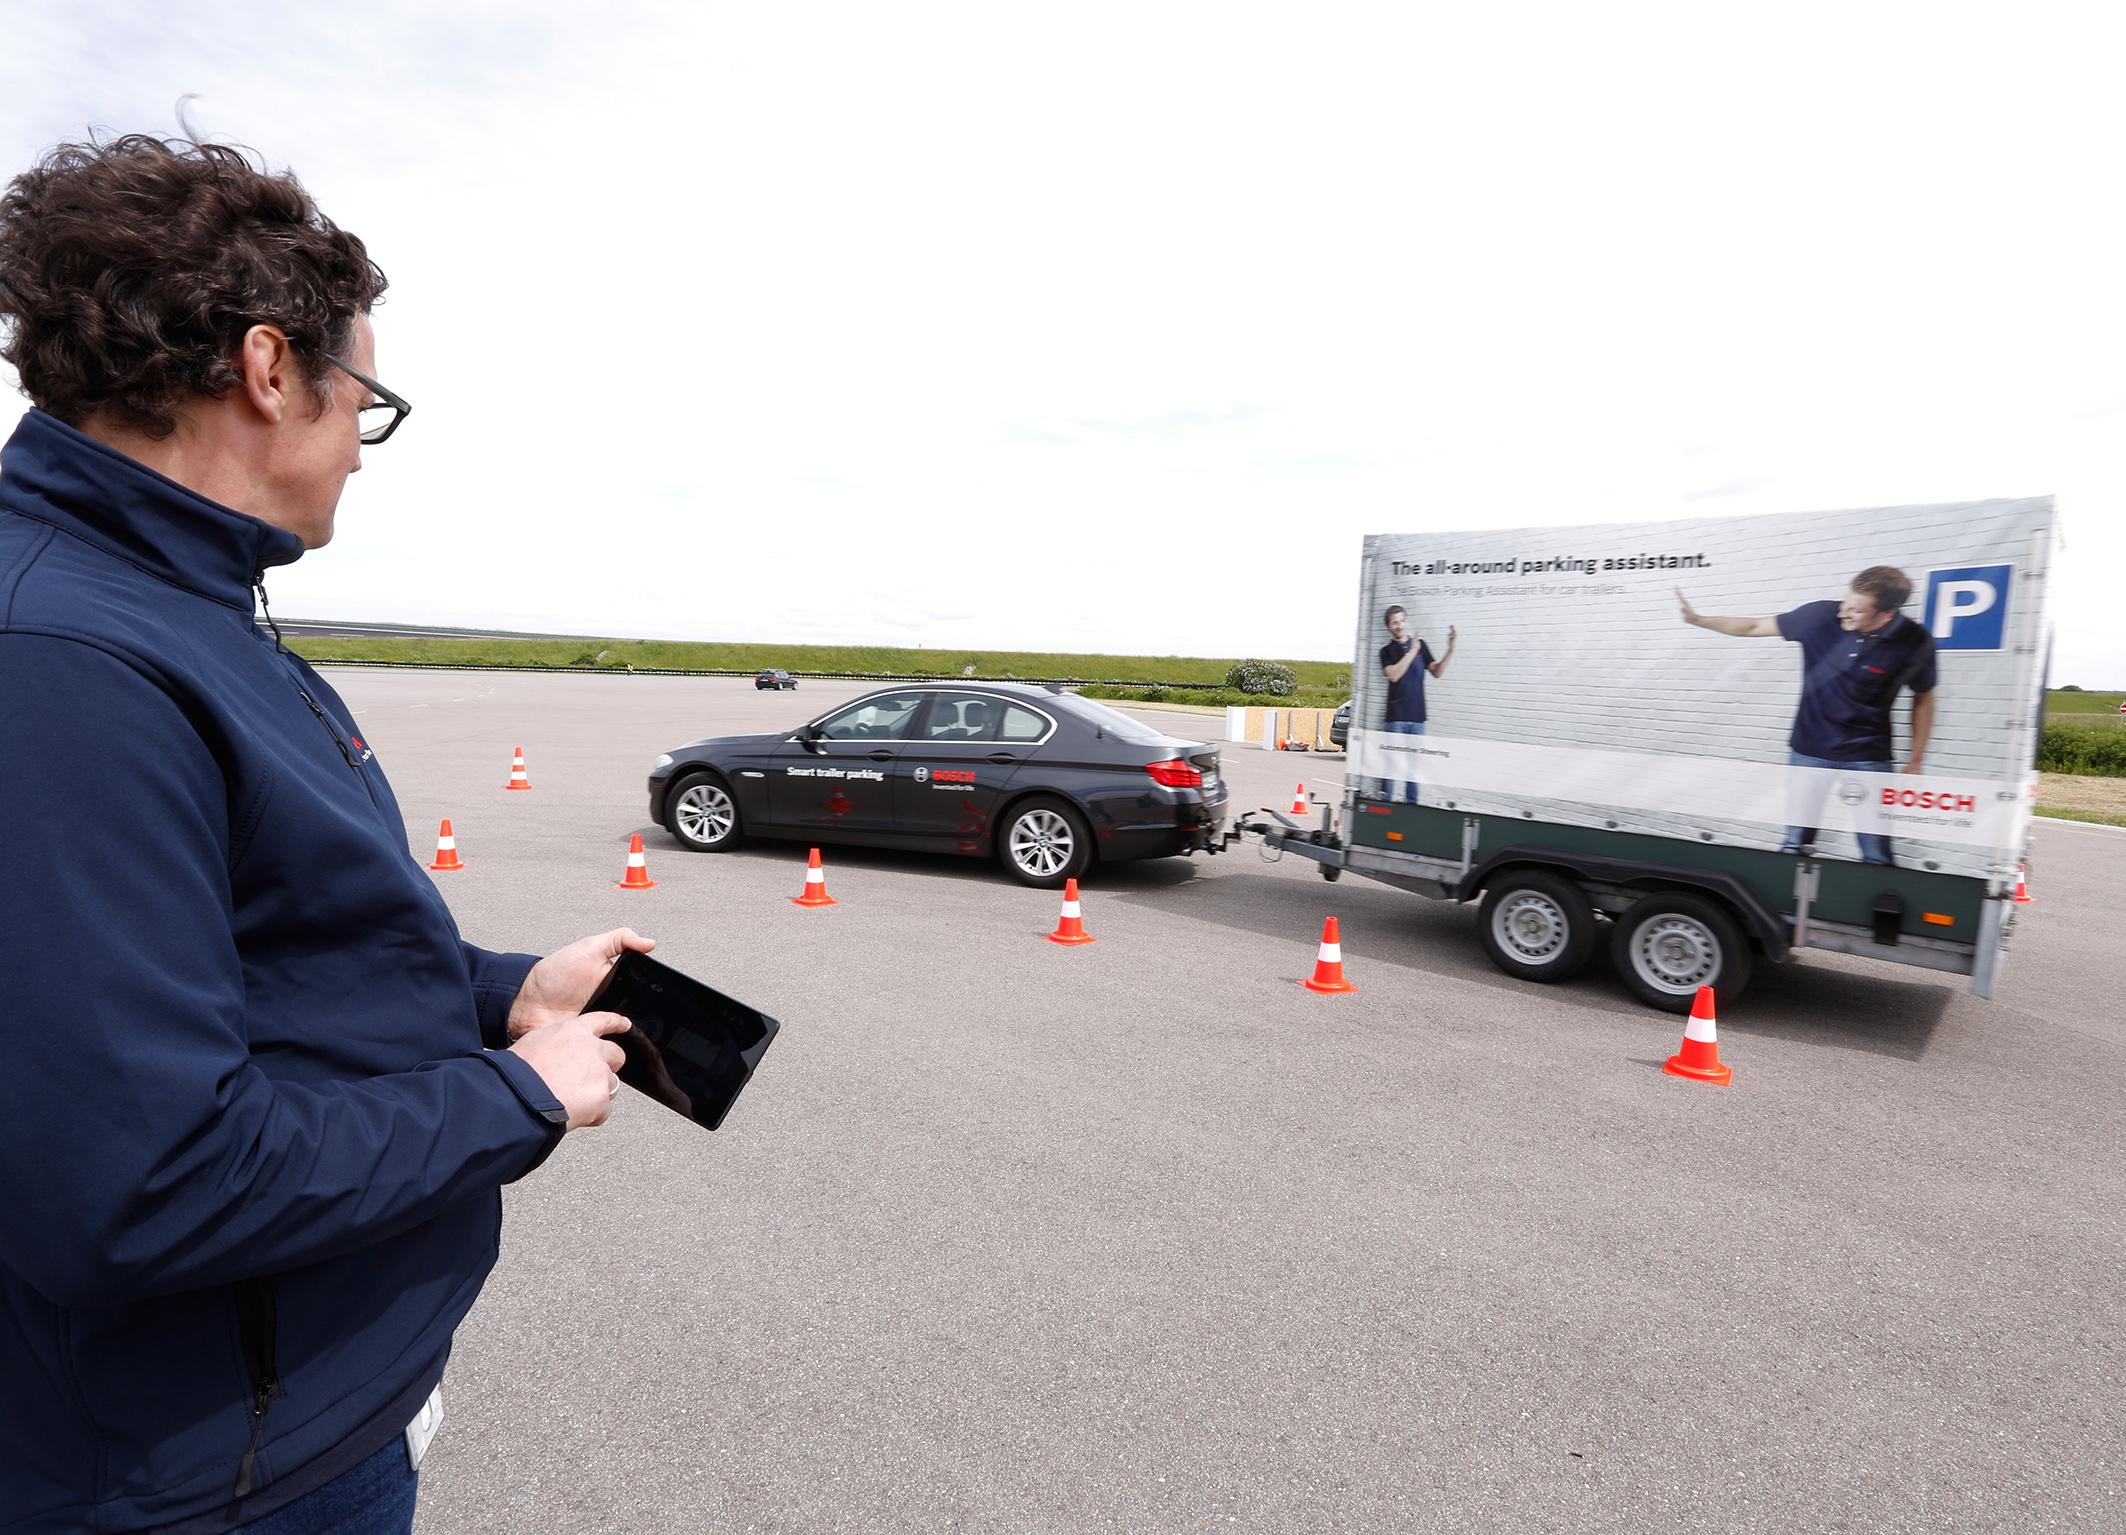 Smart trailer parking